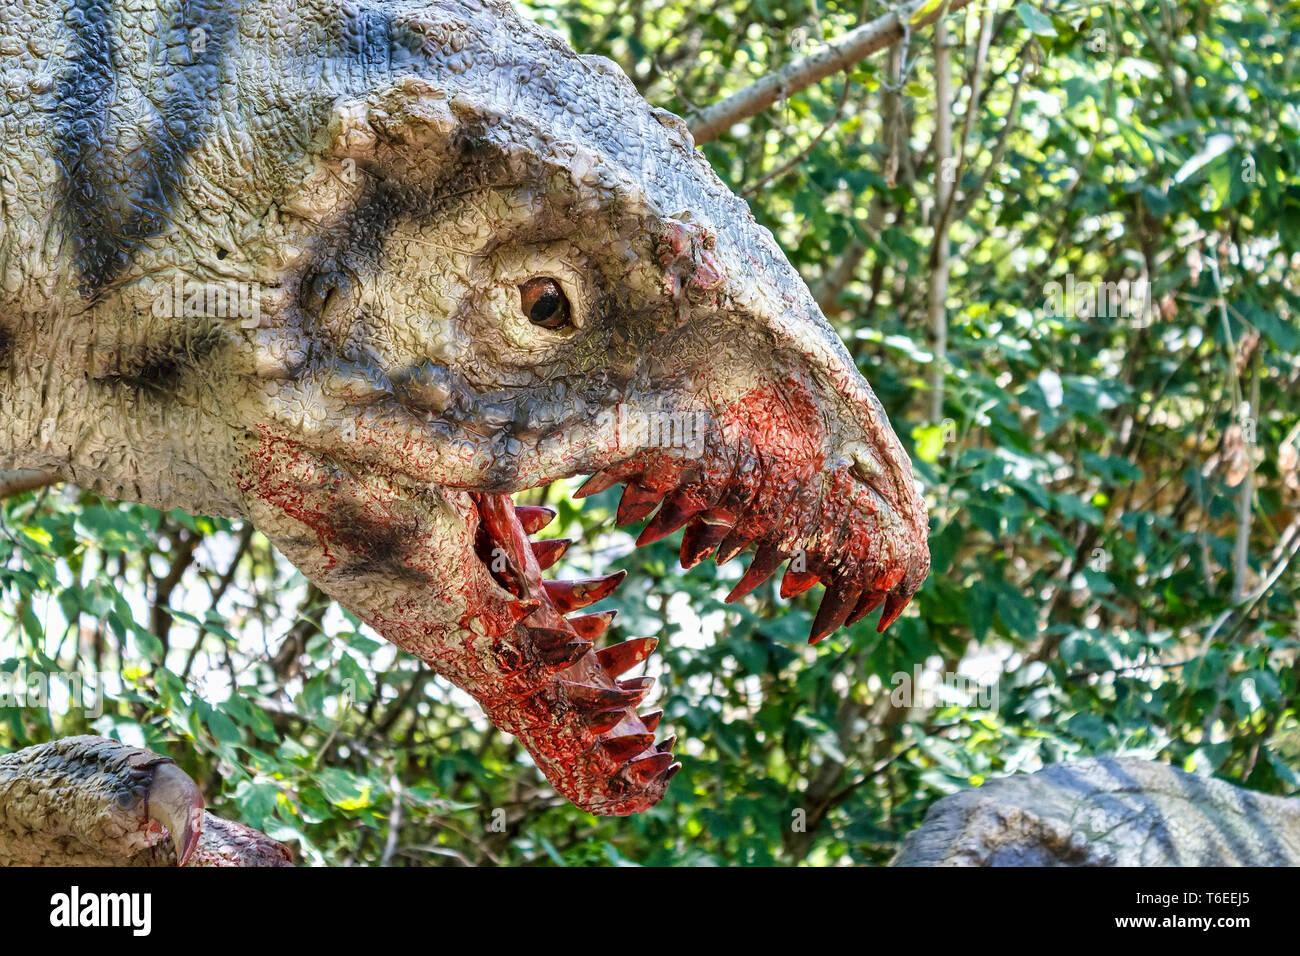 prehistoric dinosaurs raptors attacking its prey - Stock Image